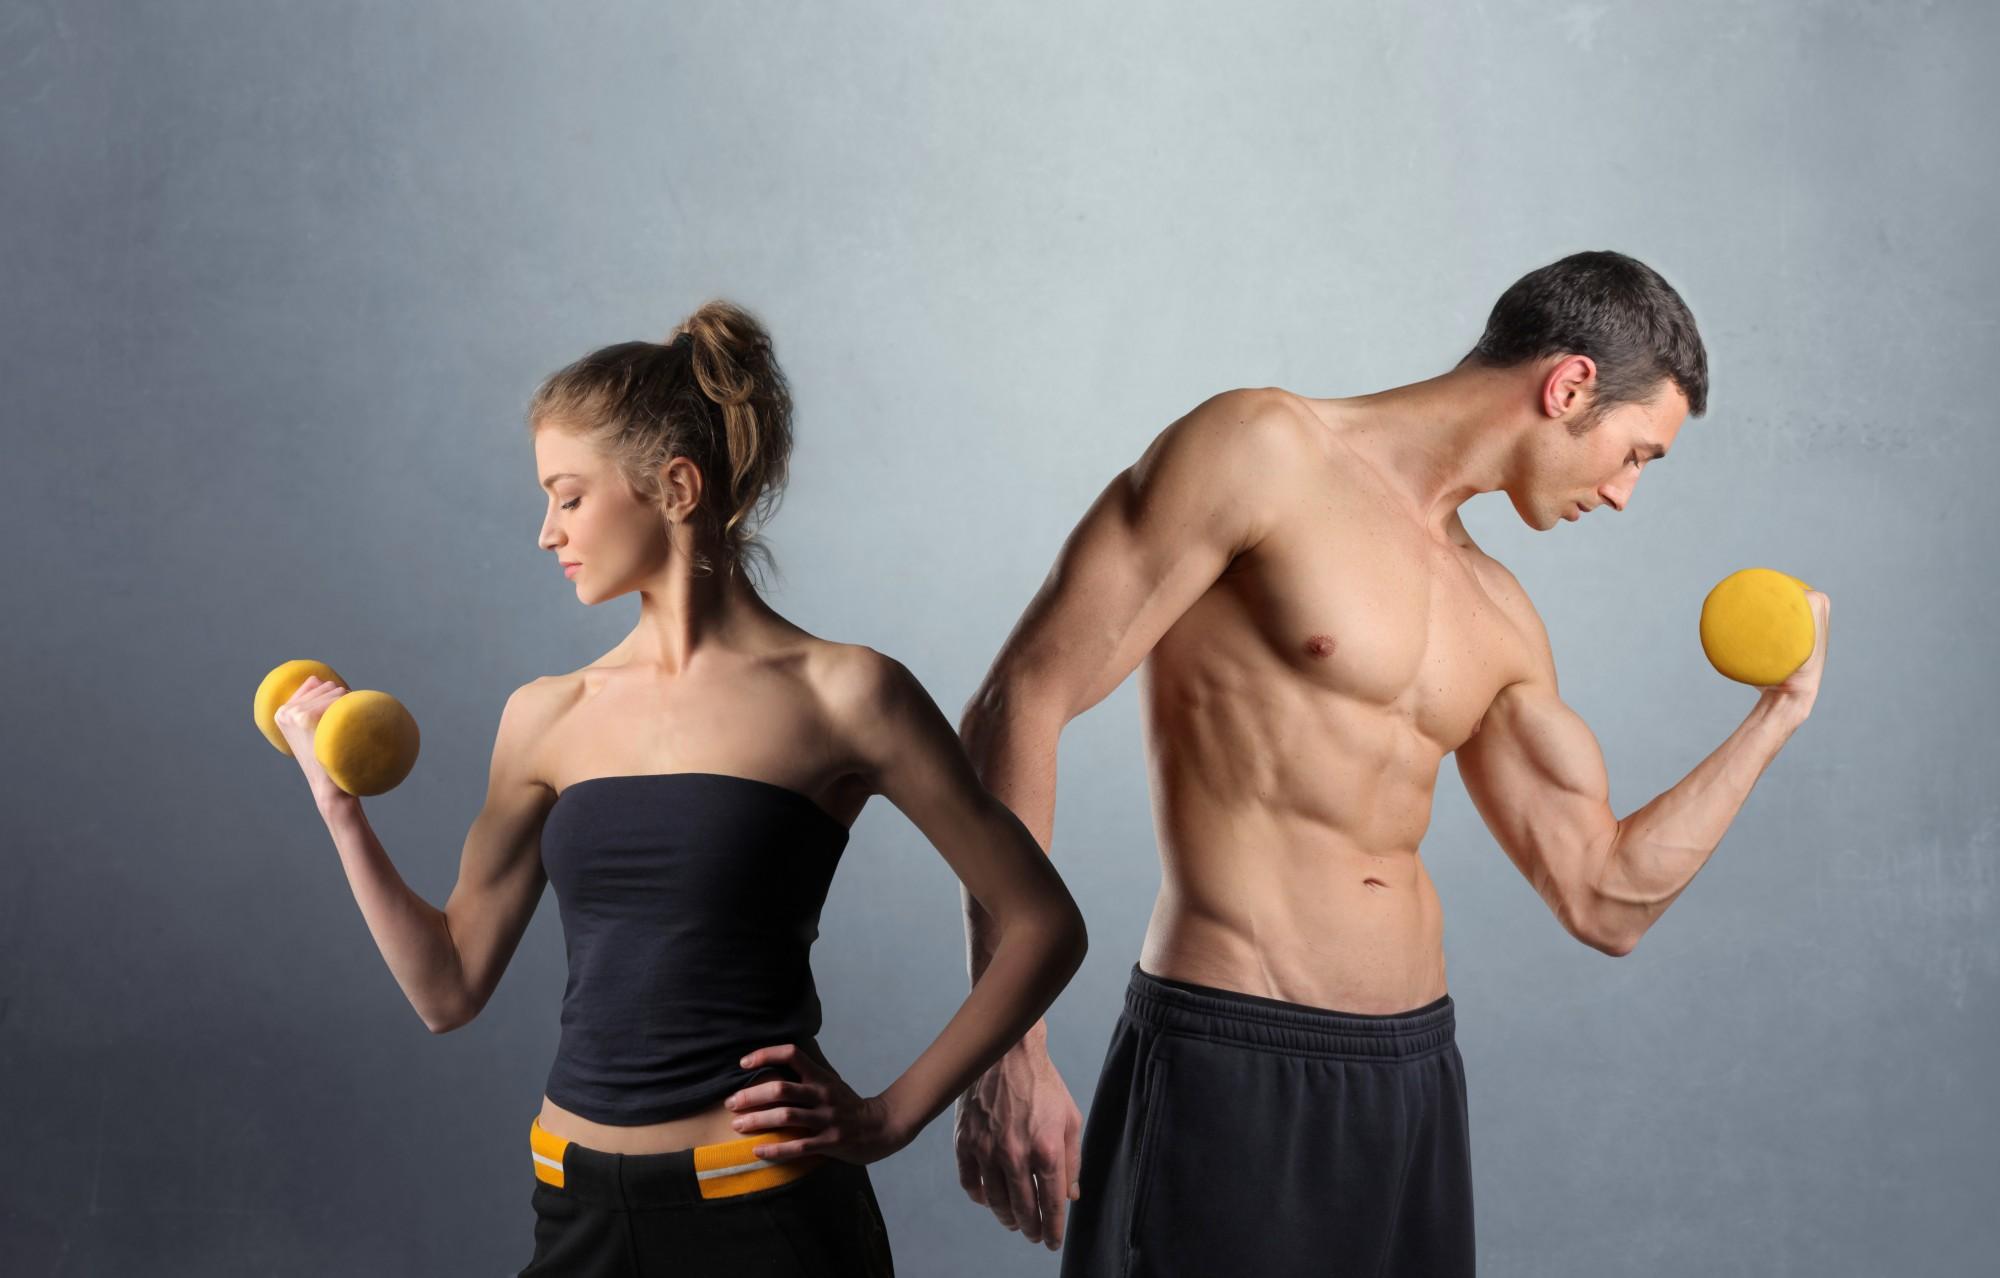 Фото на тему: Зависимость от фитнеса сравнили с наркоманией